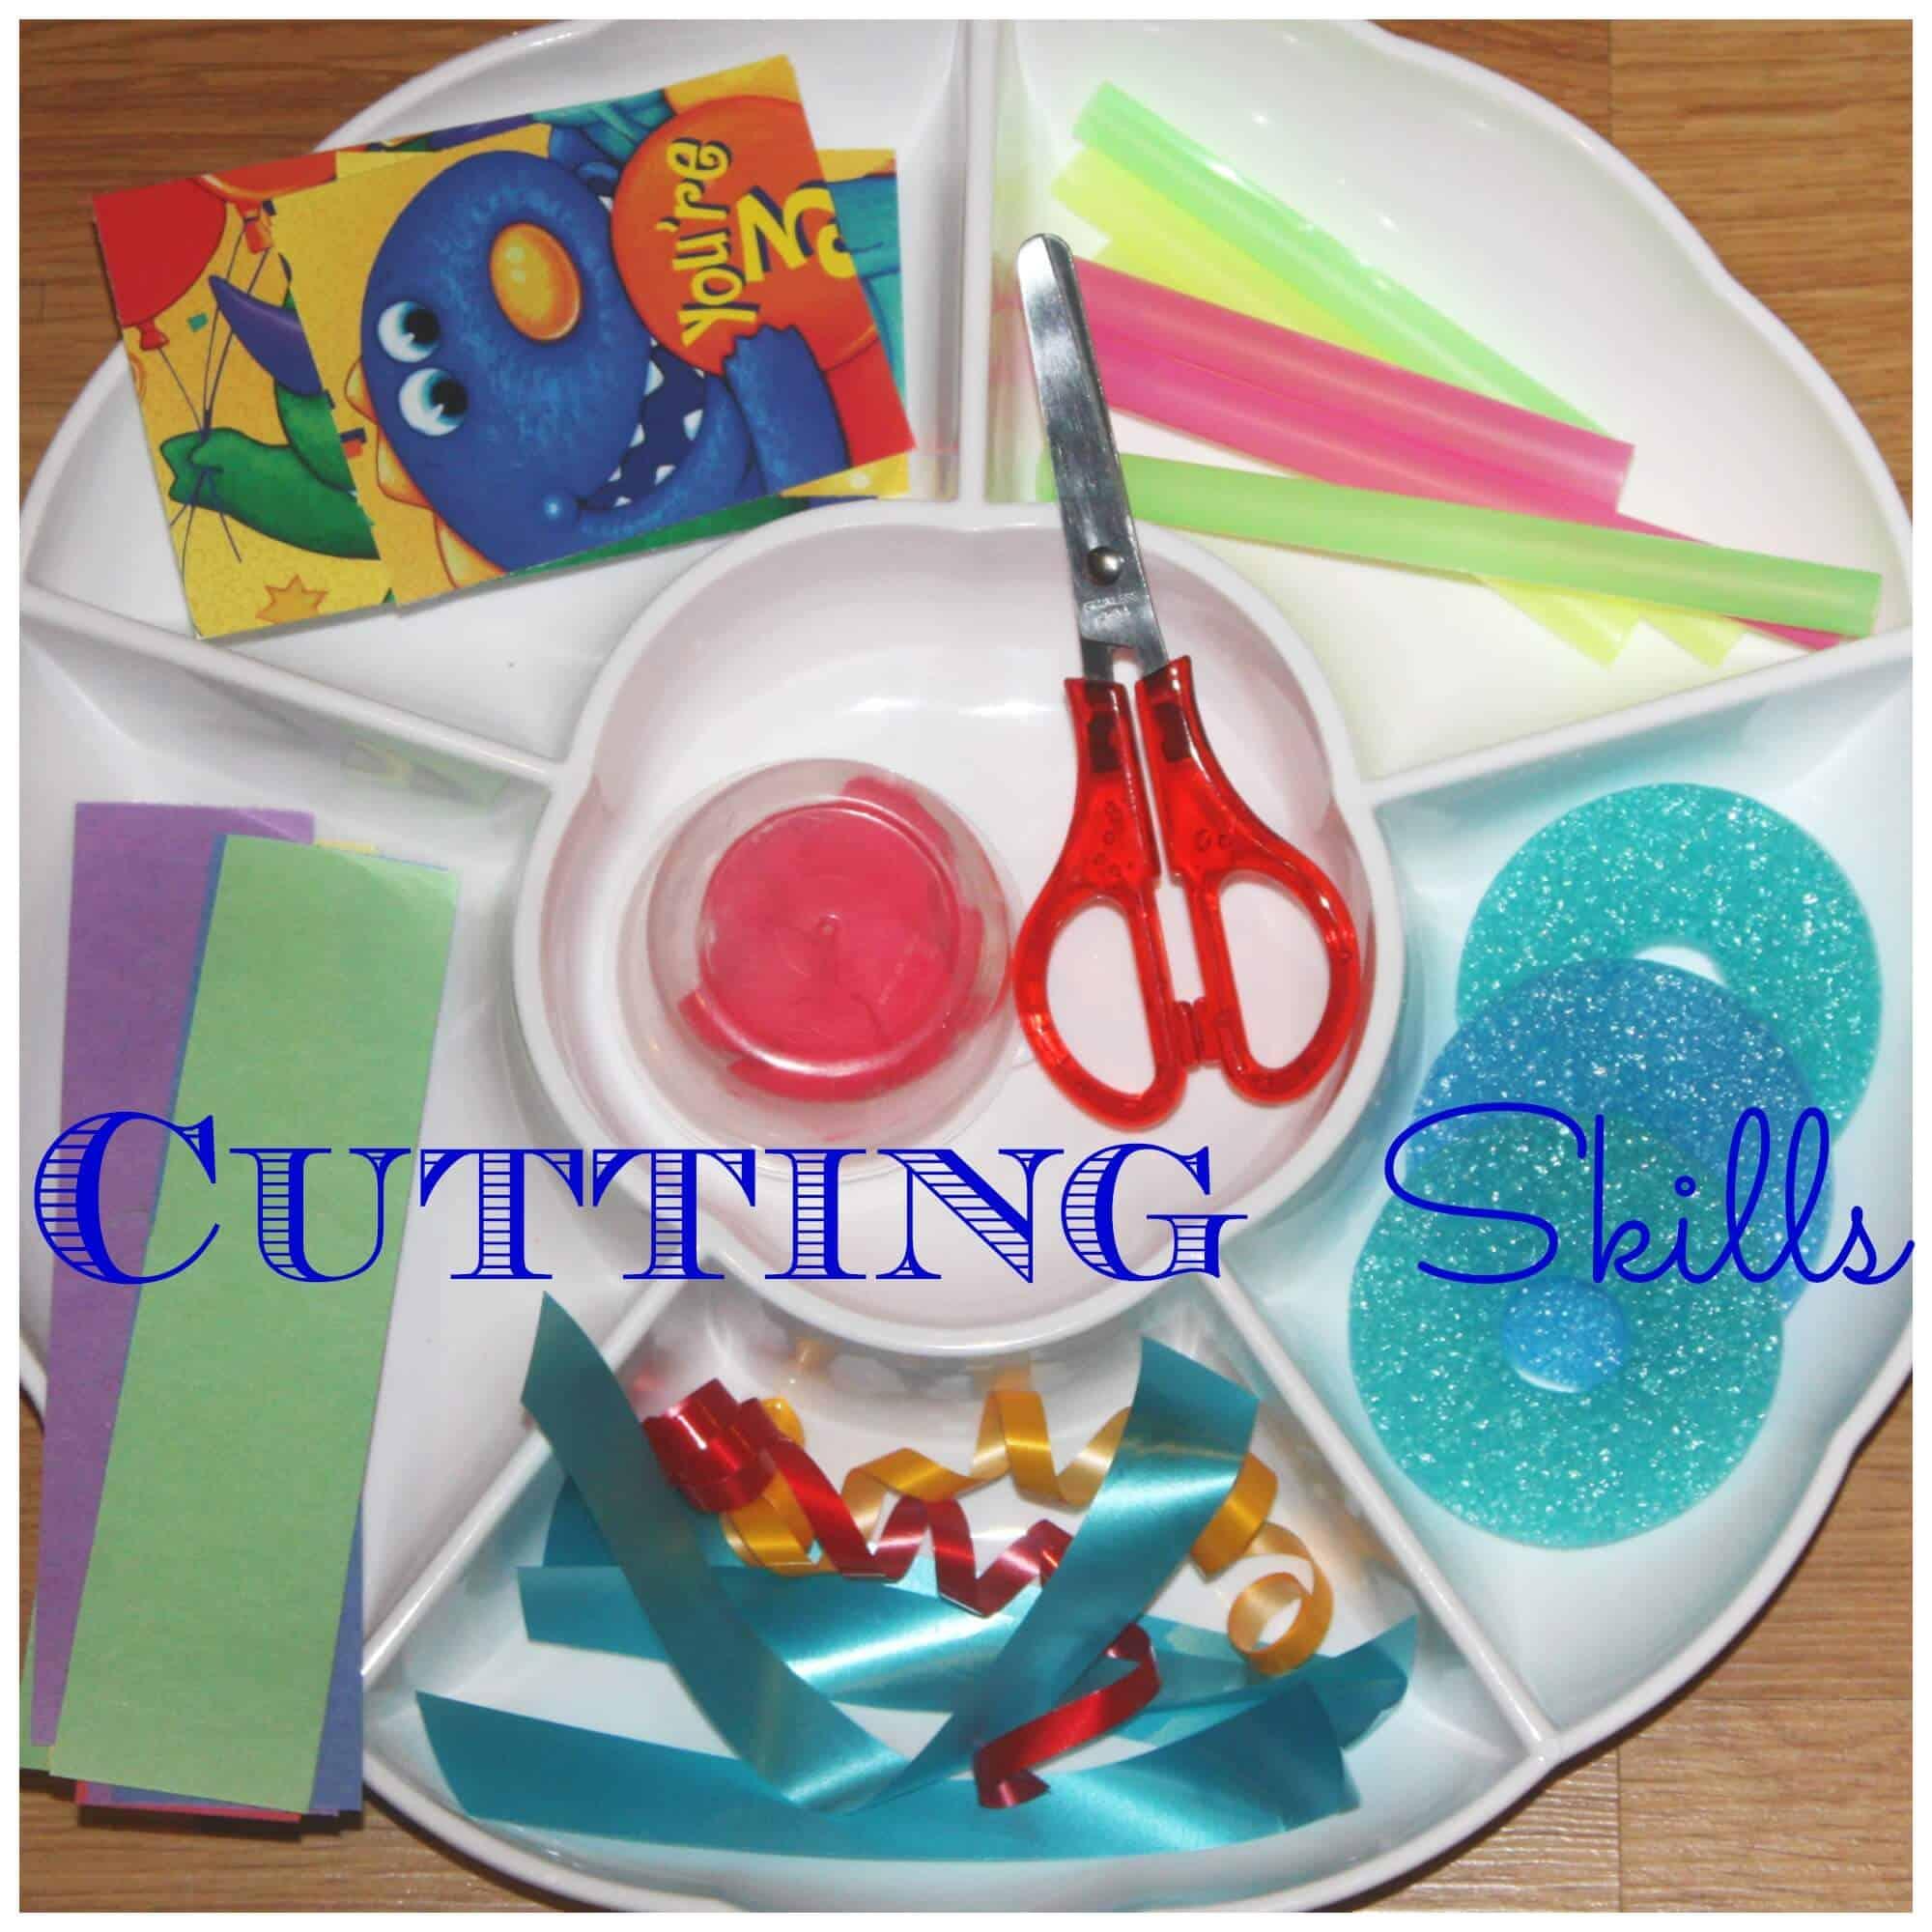 Cutting Skills Tray